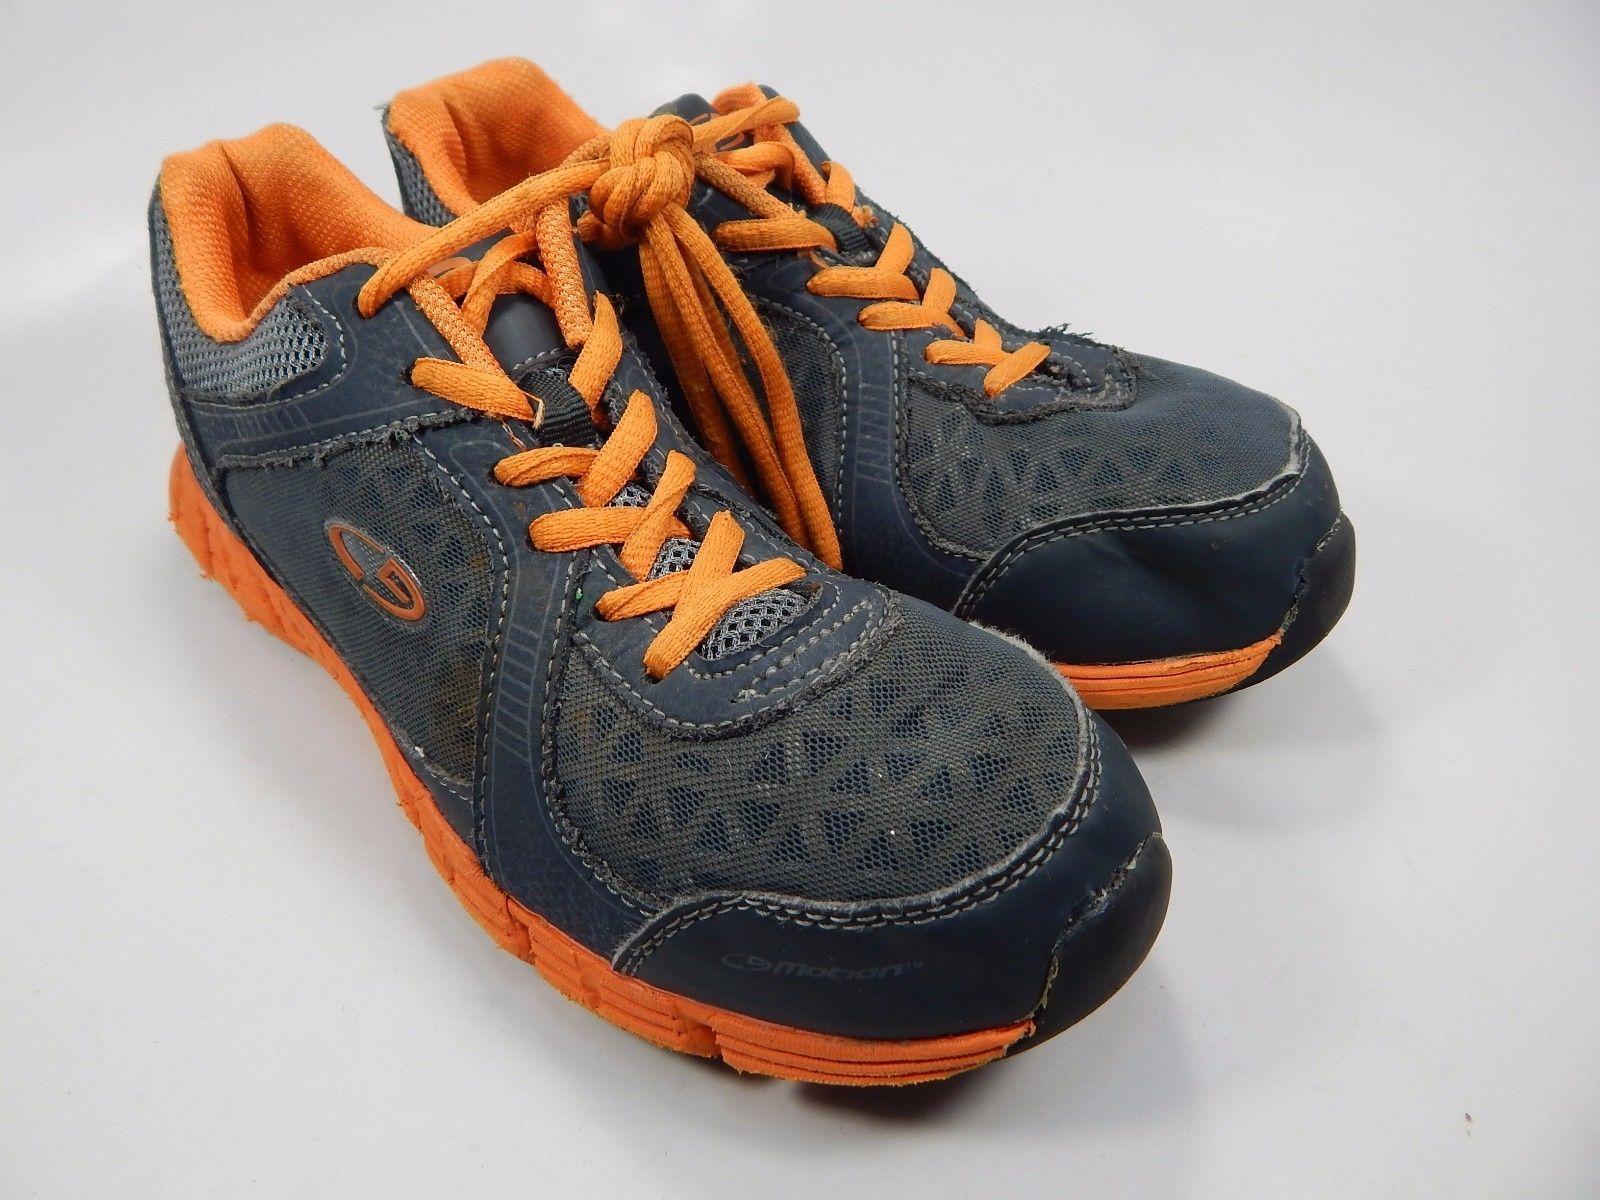 Champion Boys Athletic Shoes US Size 4.5 Y Youth (M) EU 37 Orange Gray